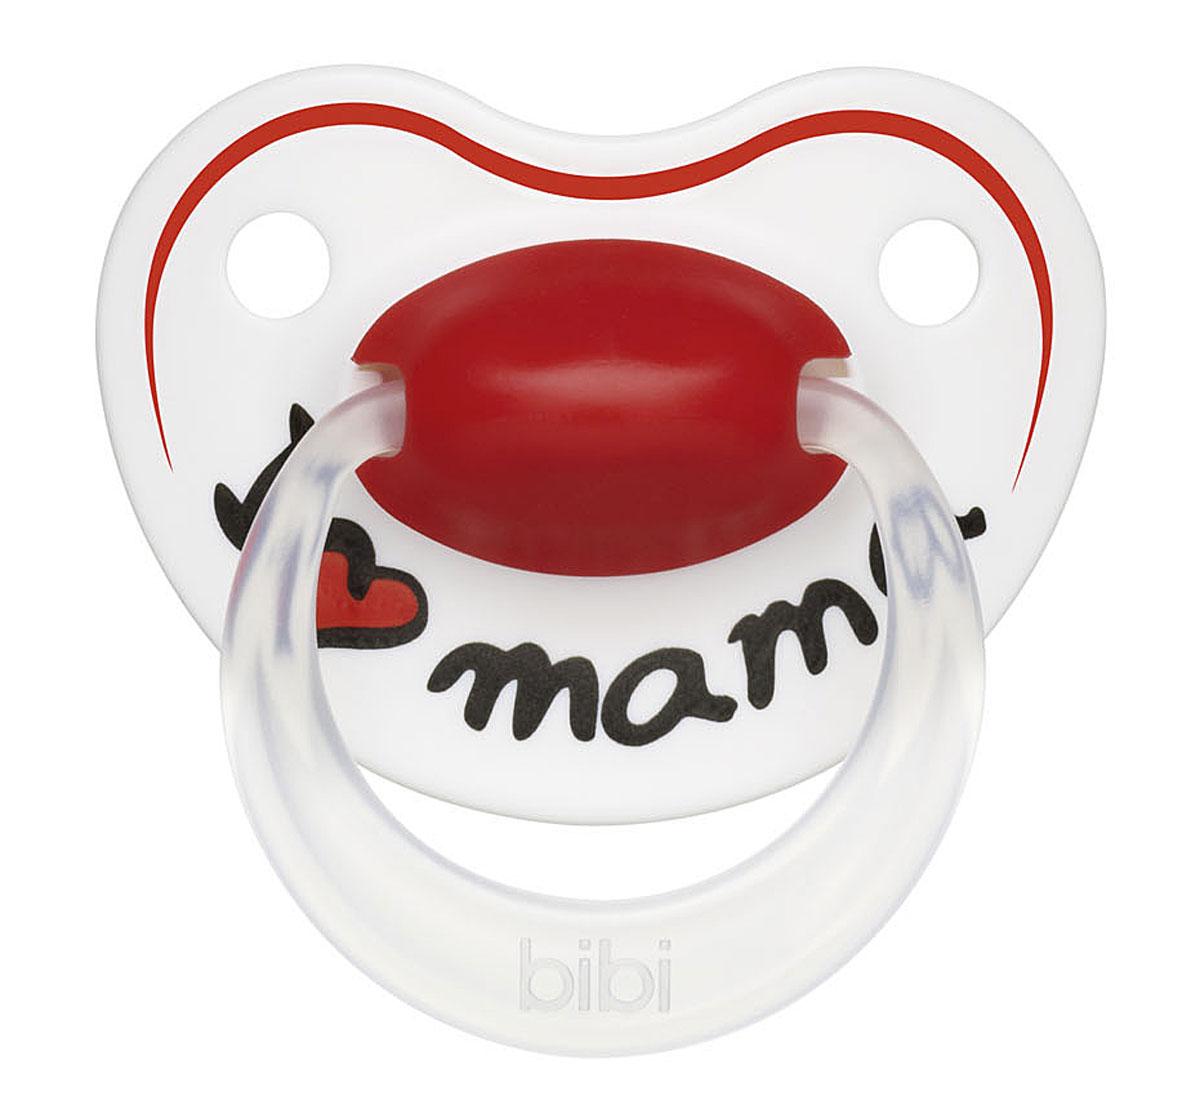 Bibi Пустышка силиконовая Premium Dental Happiness Mama от 6 до 16 месяцев happiness basics толстовка